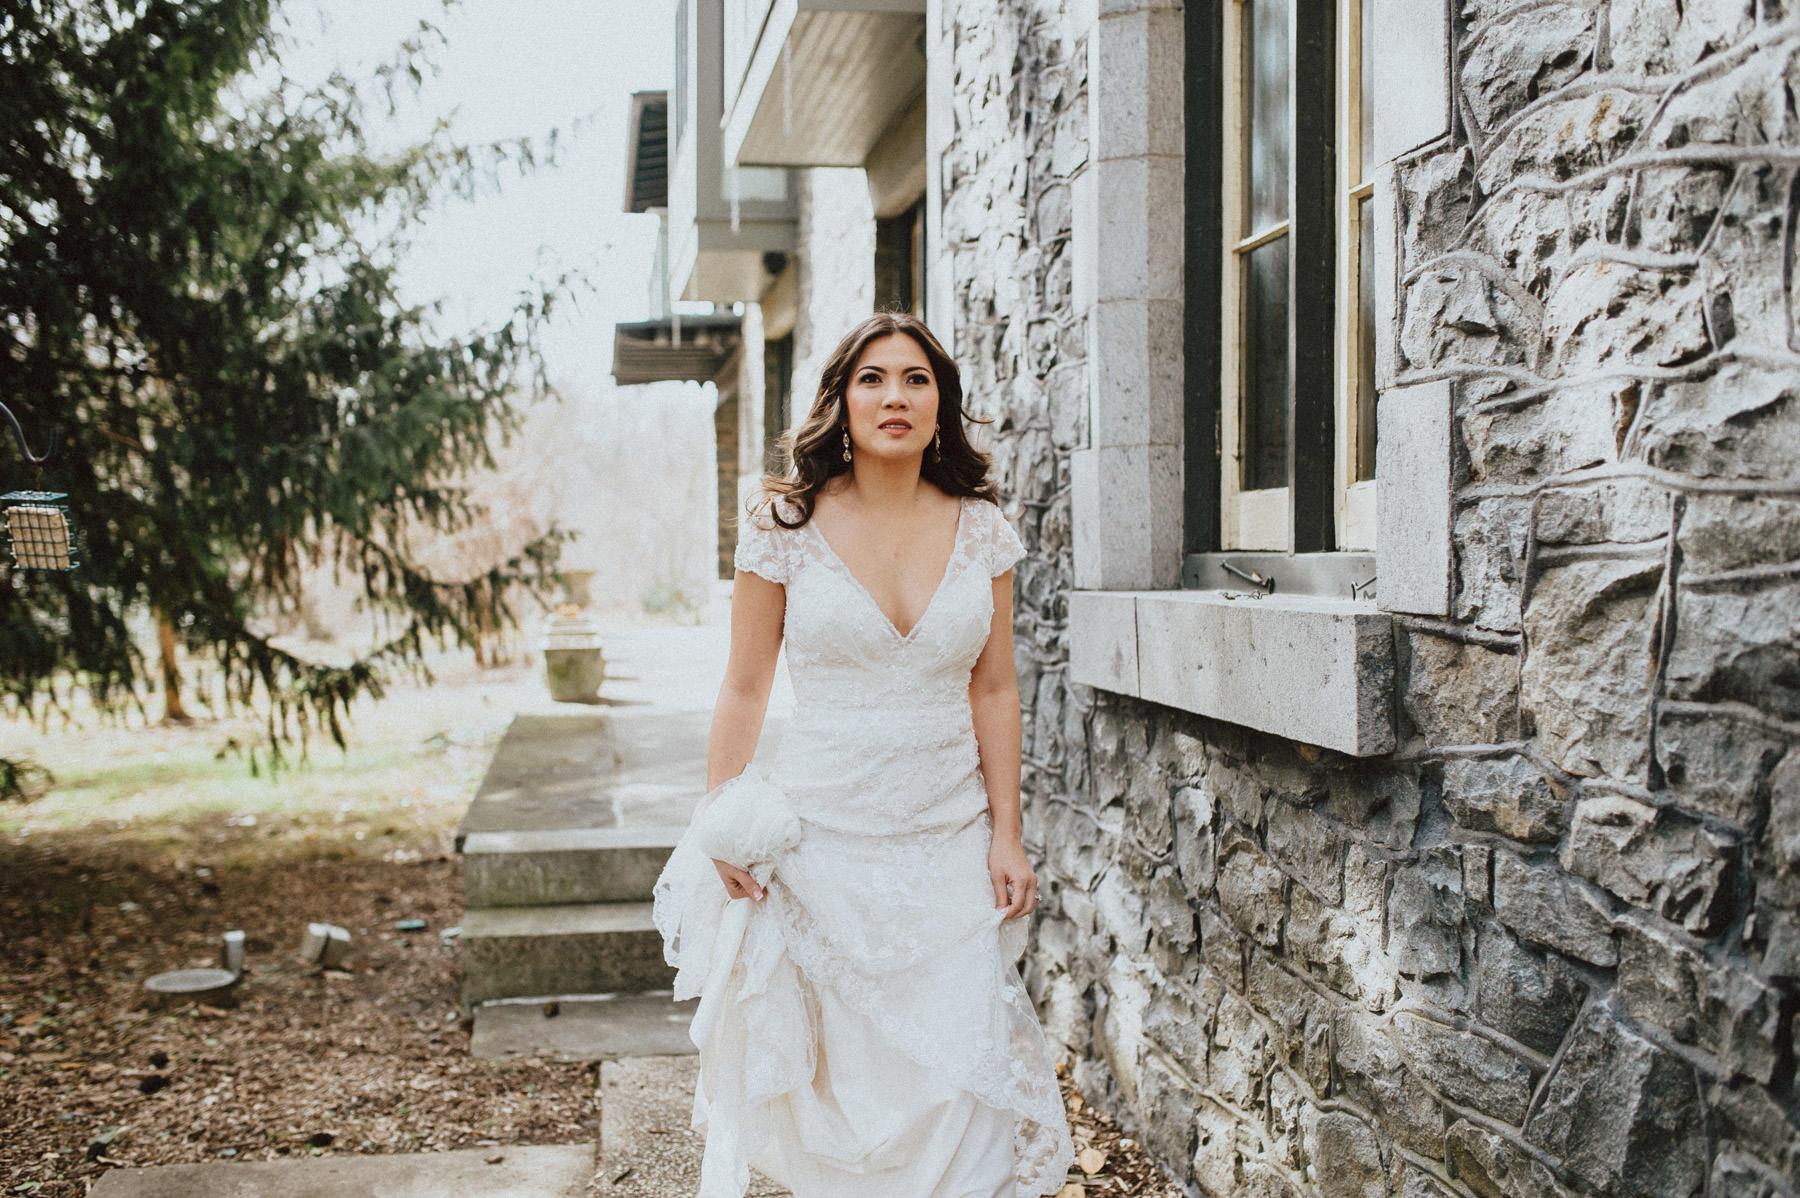 018-rockwood-carraige-house-wedding-7.jpg